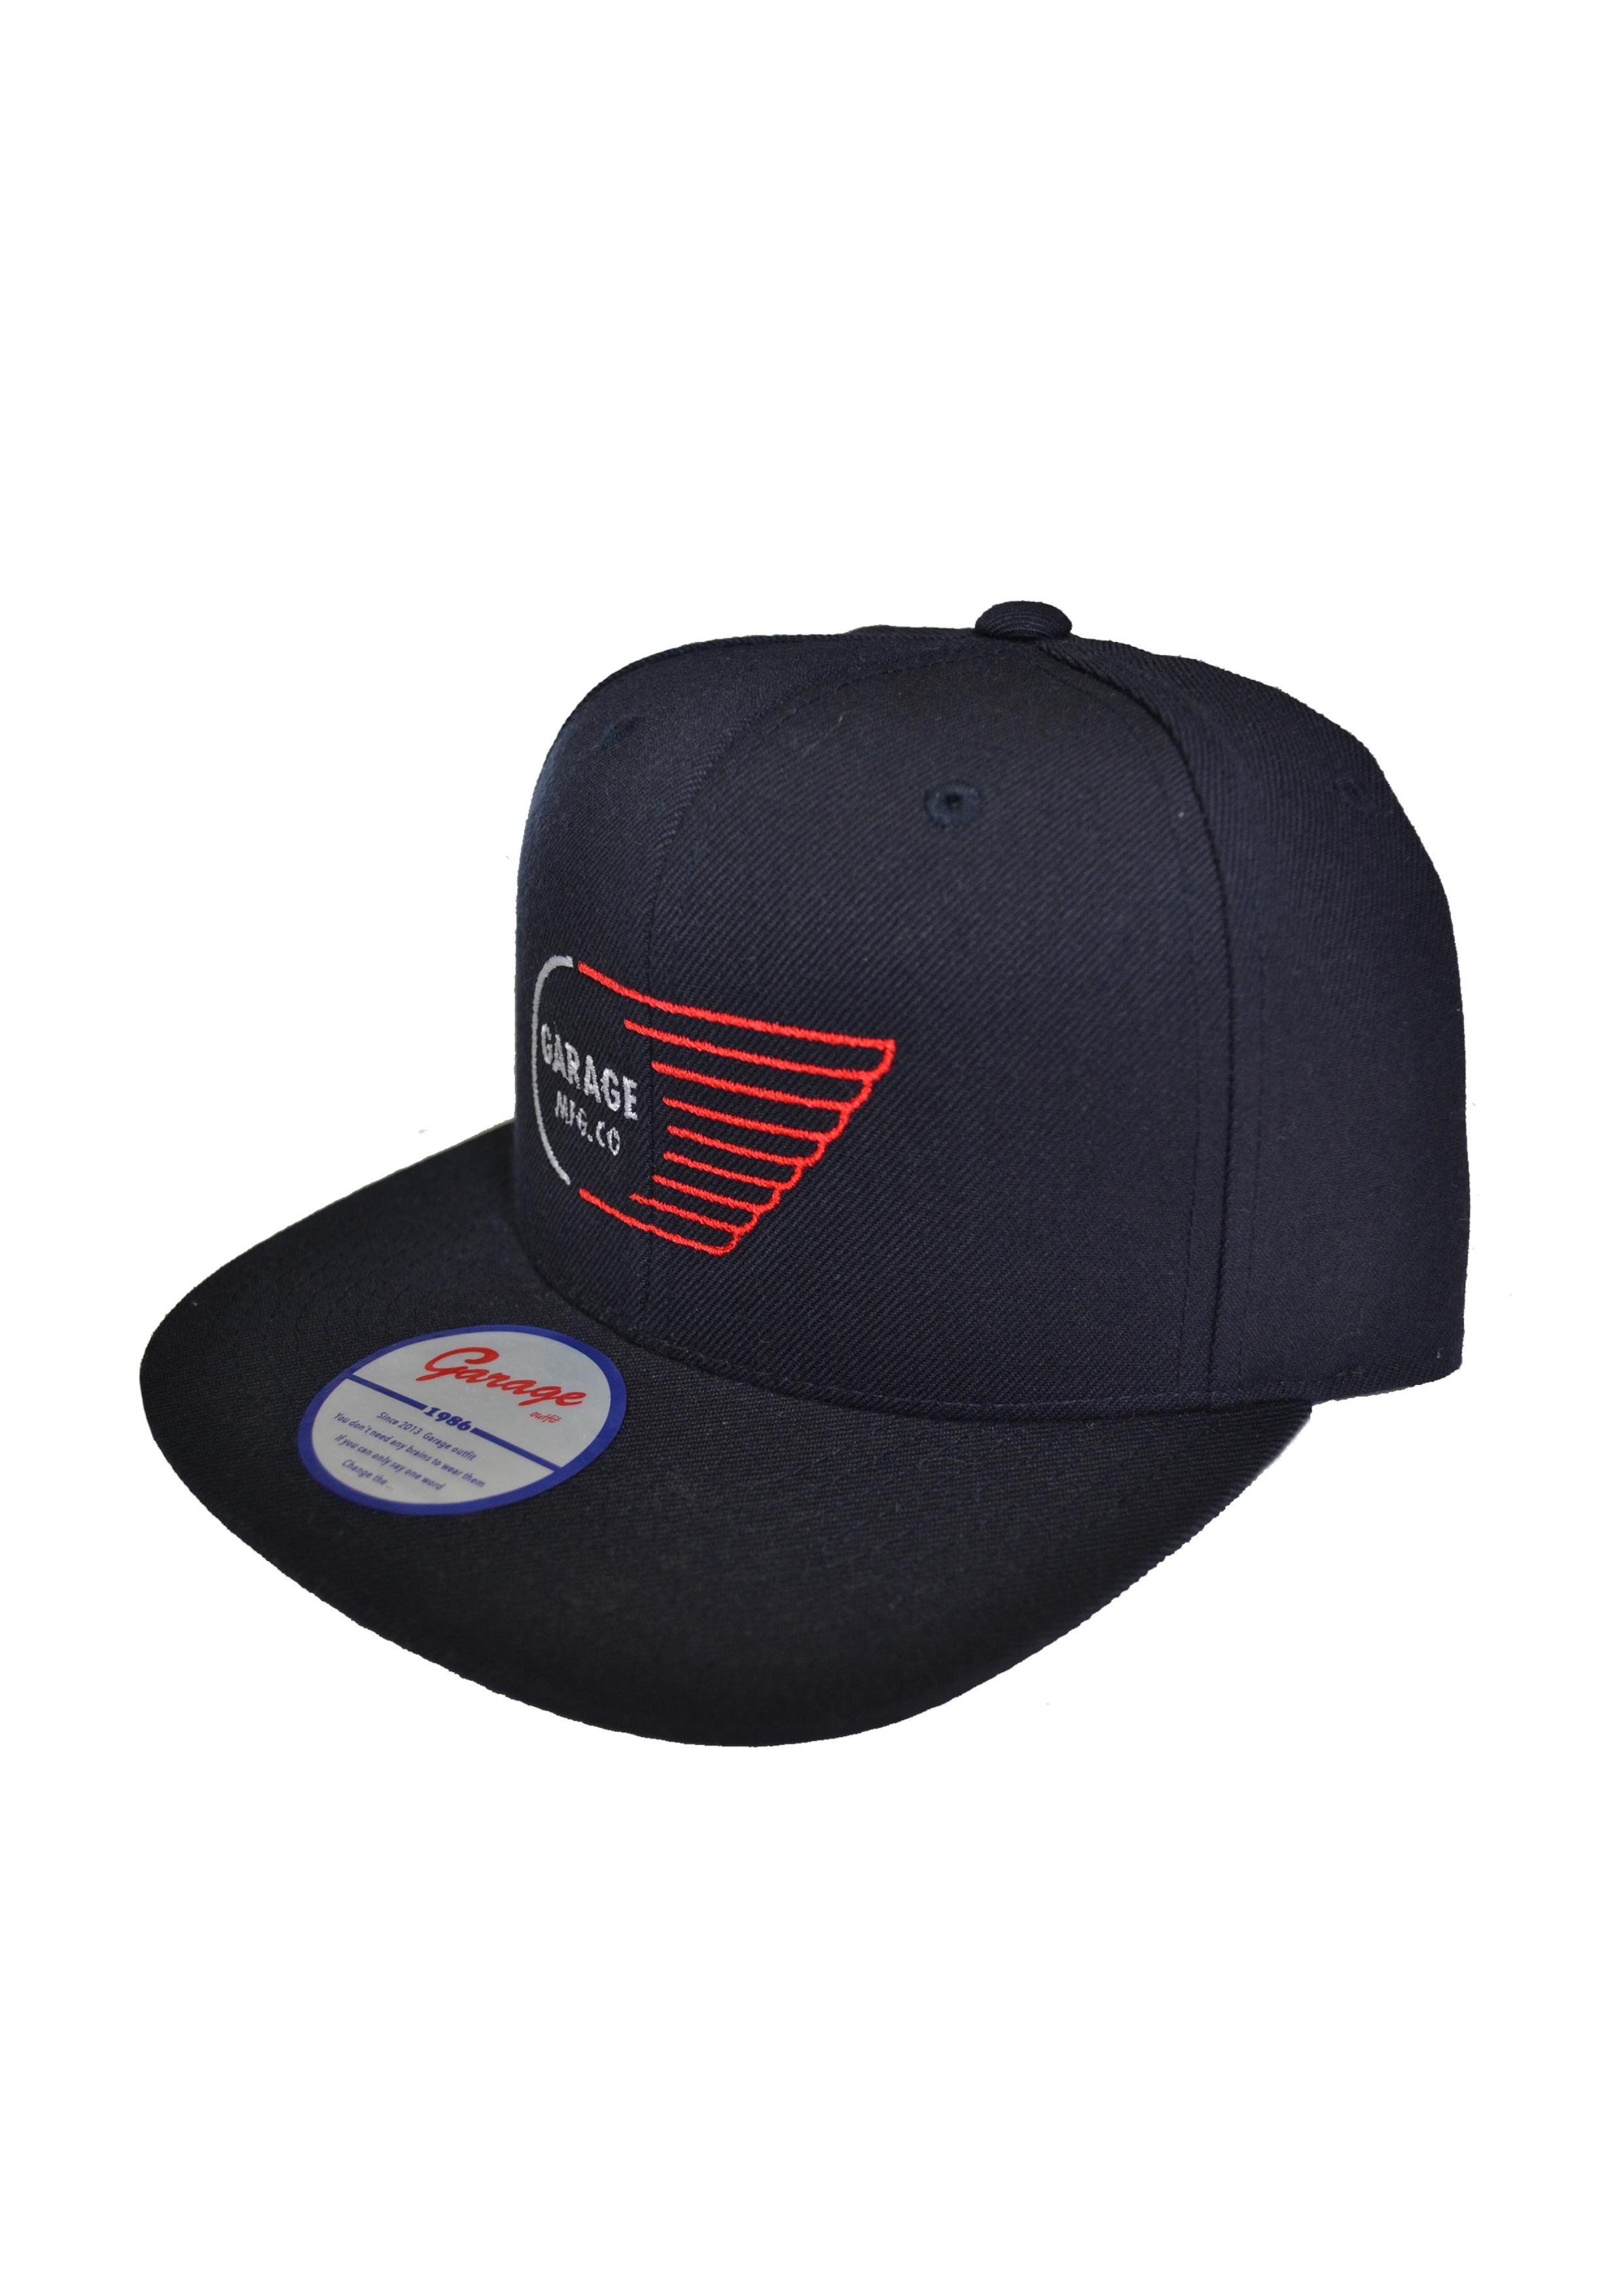 Wing logo cap Navy